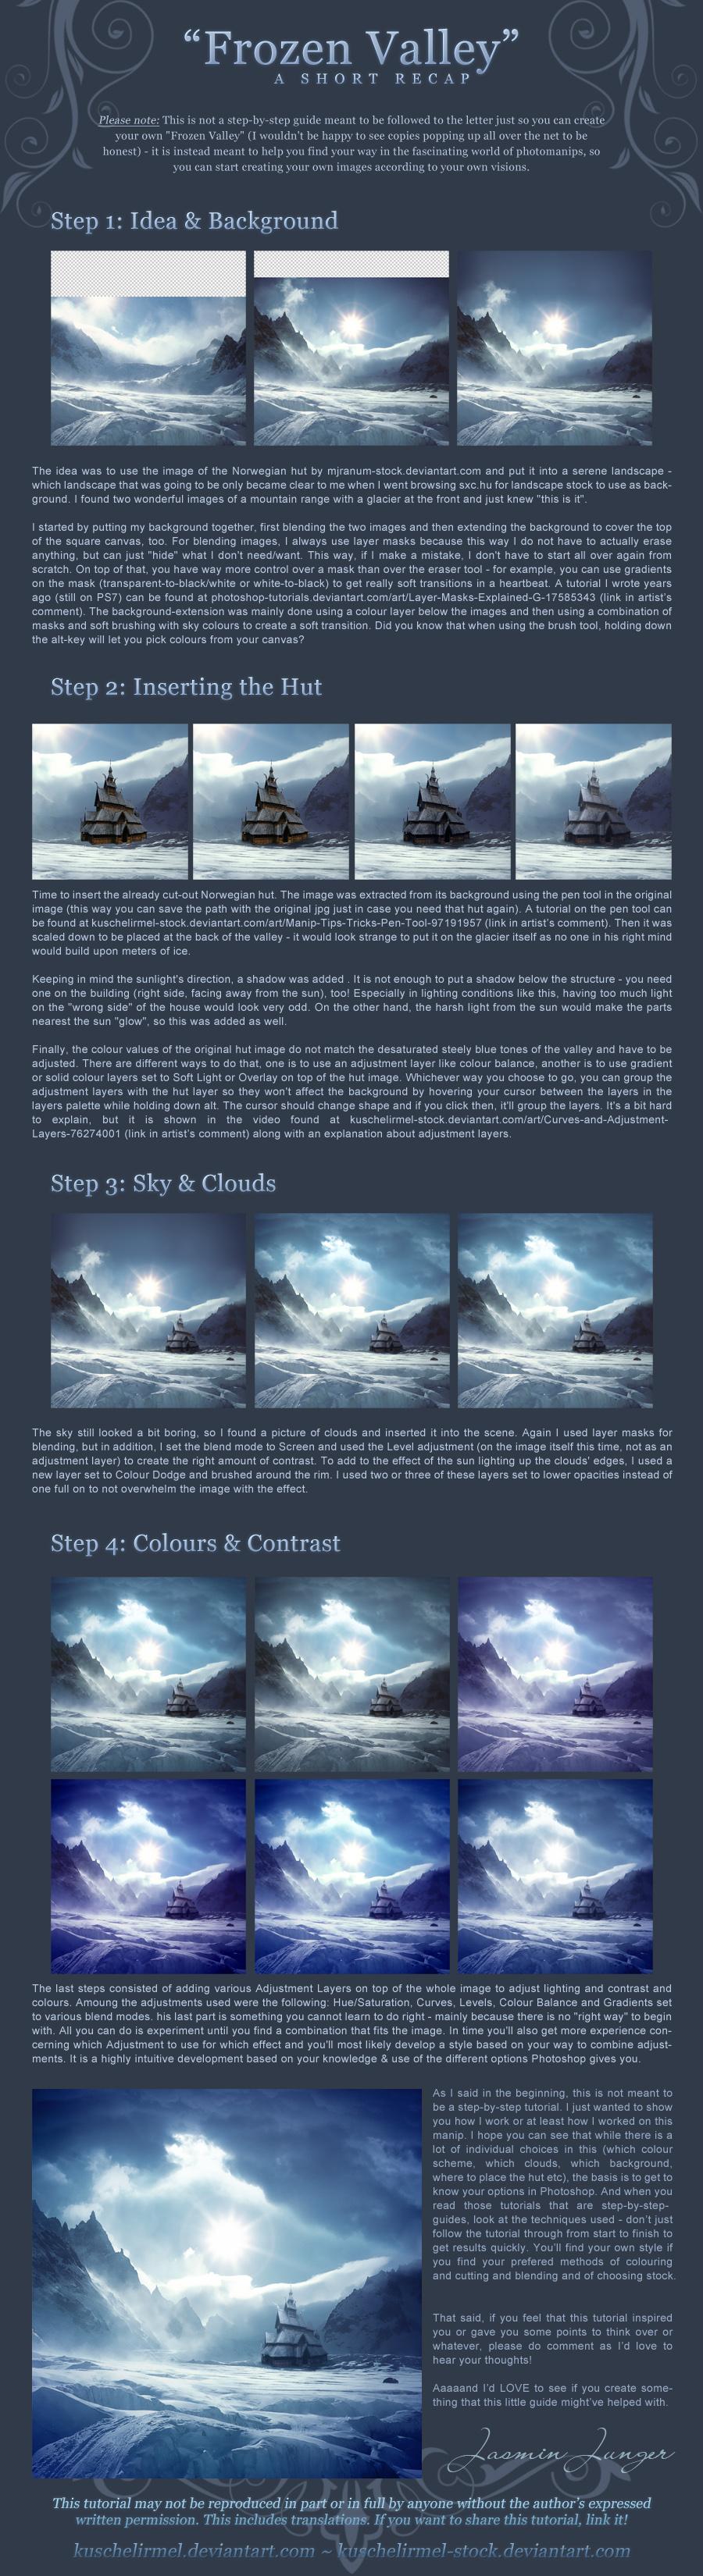 Frozen Valley Guide